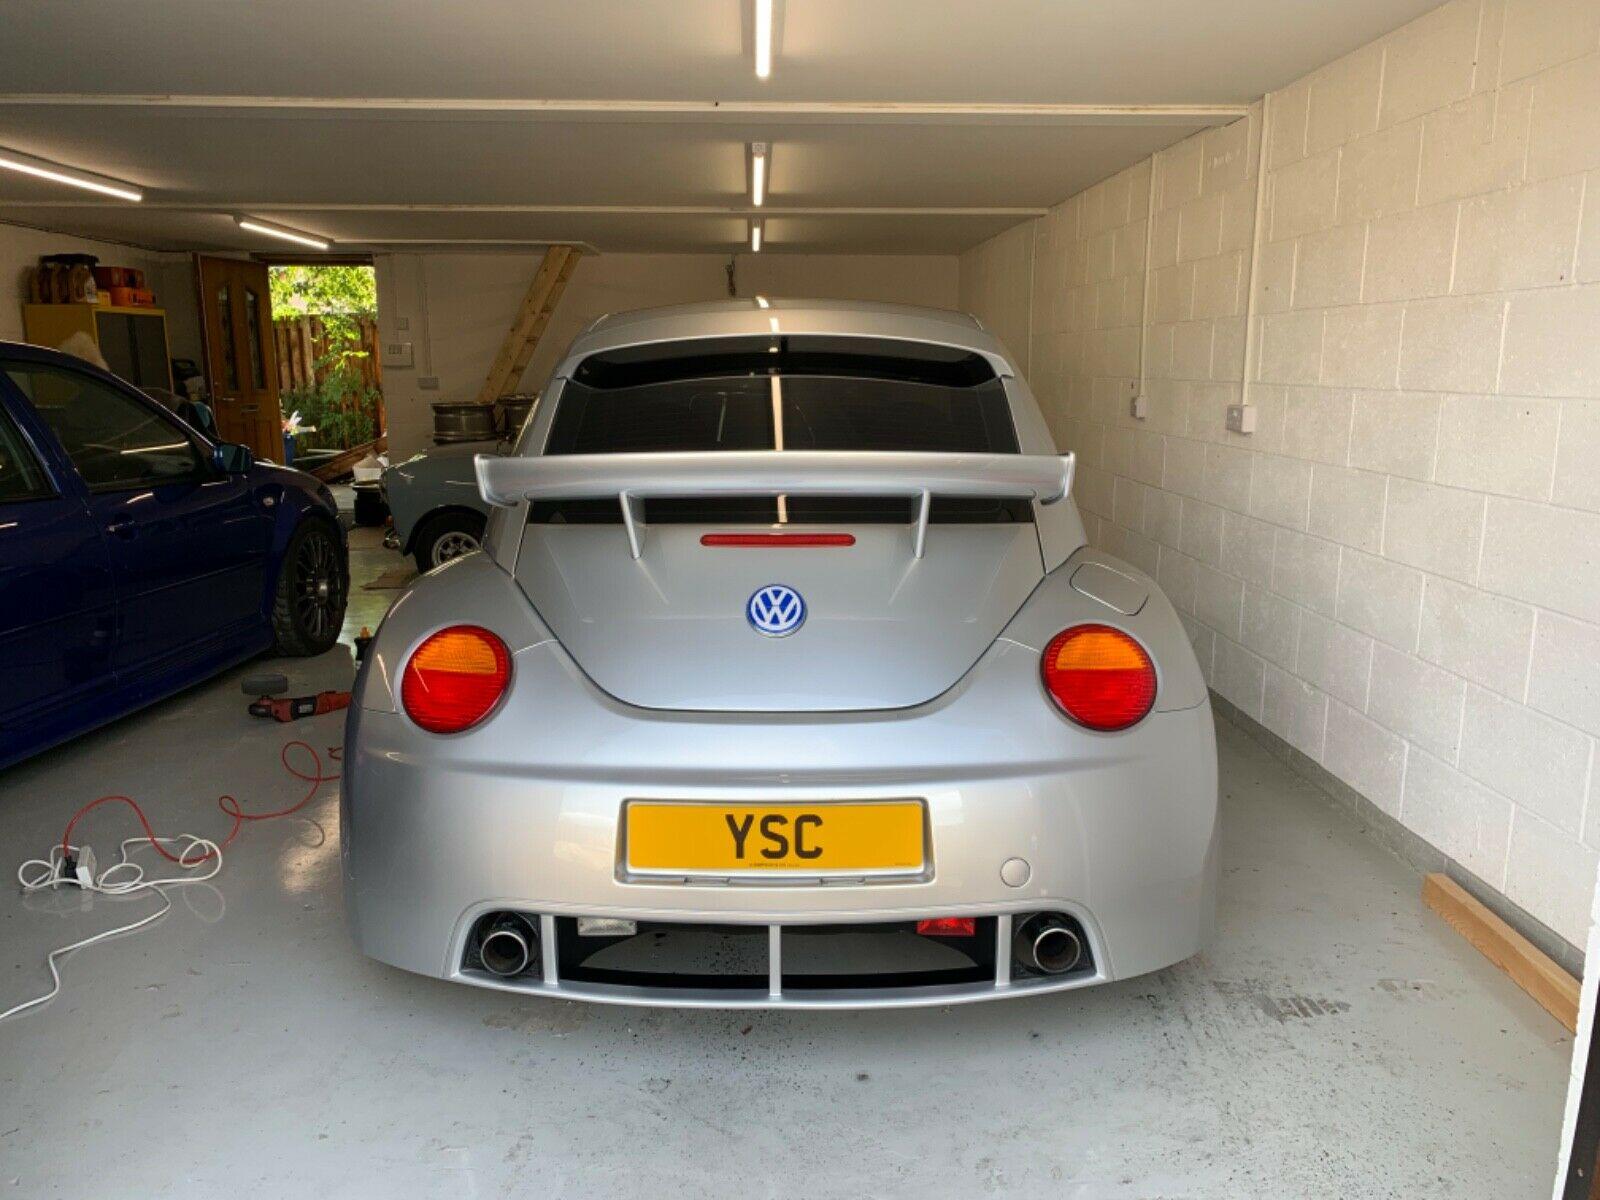 Volkswagen-Beetle-RSi-for-sale-6